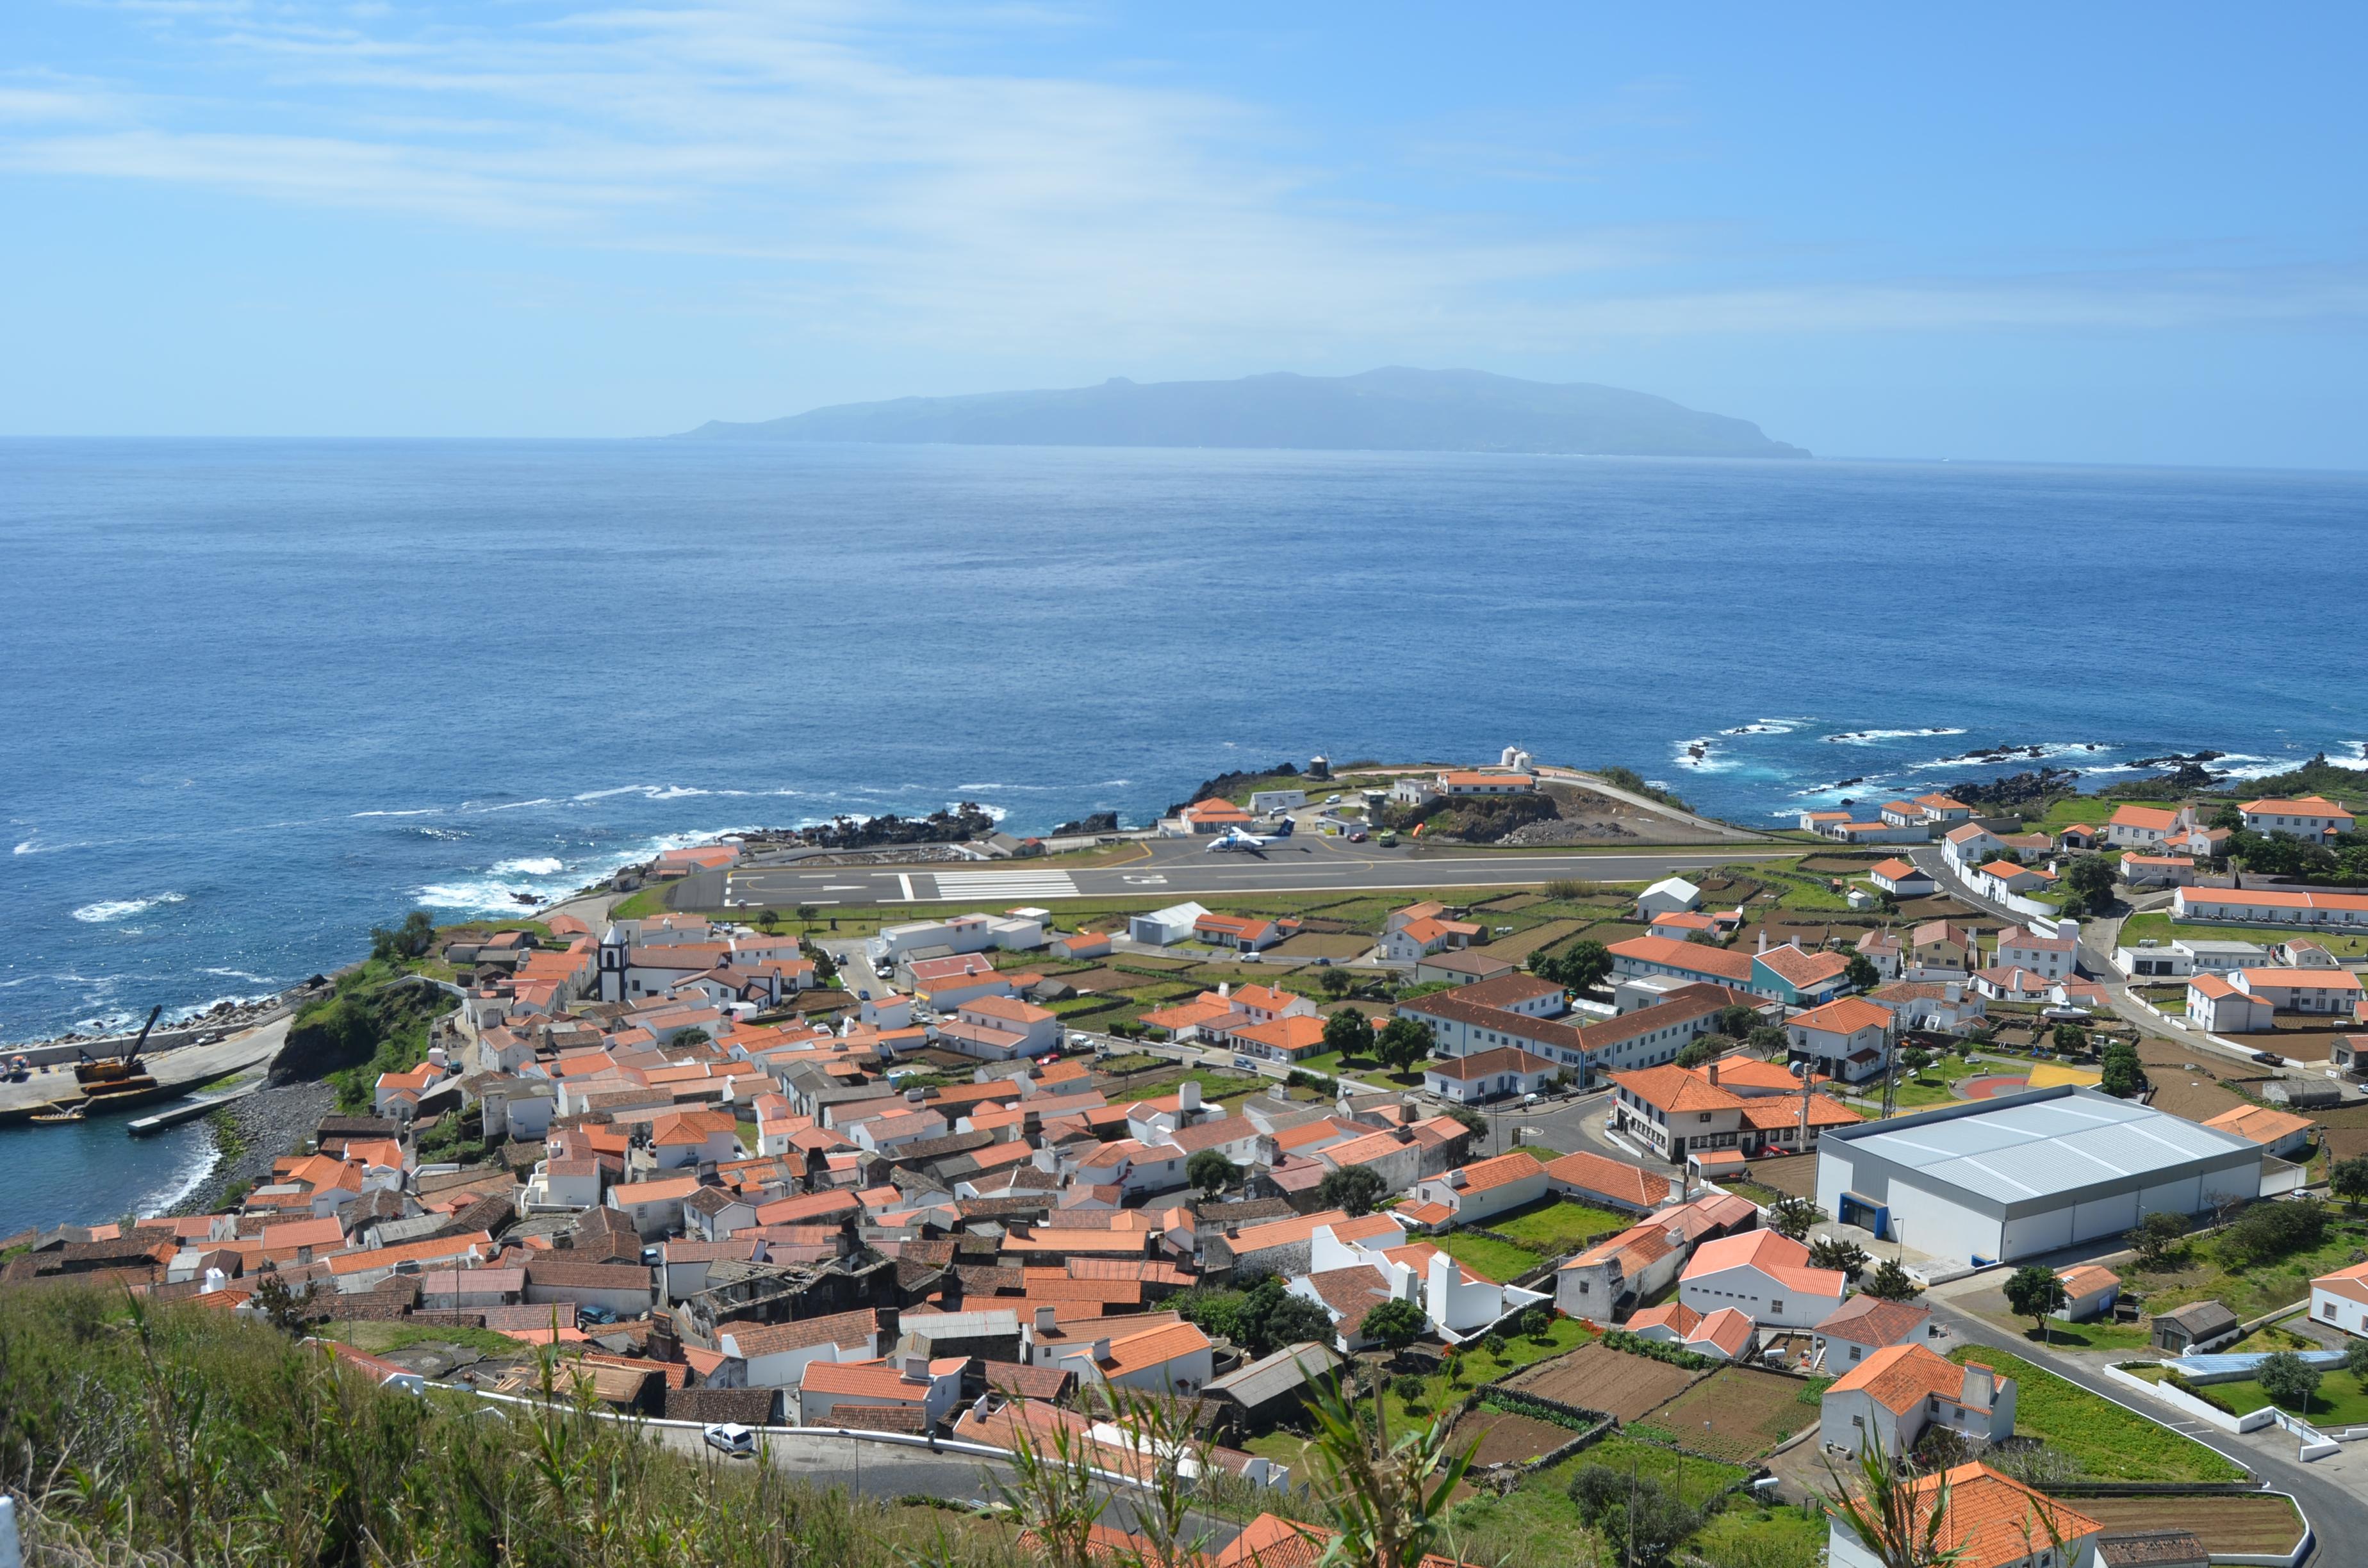 Vila do Corvo - Wikipedia